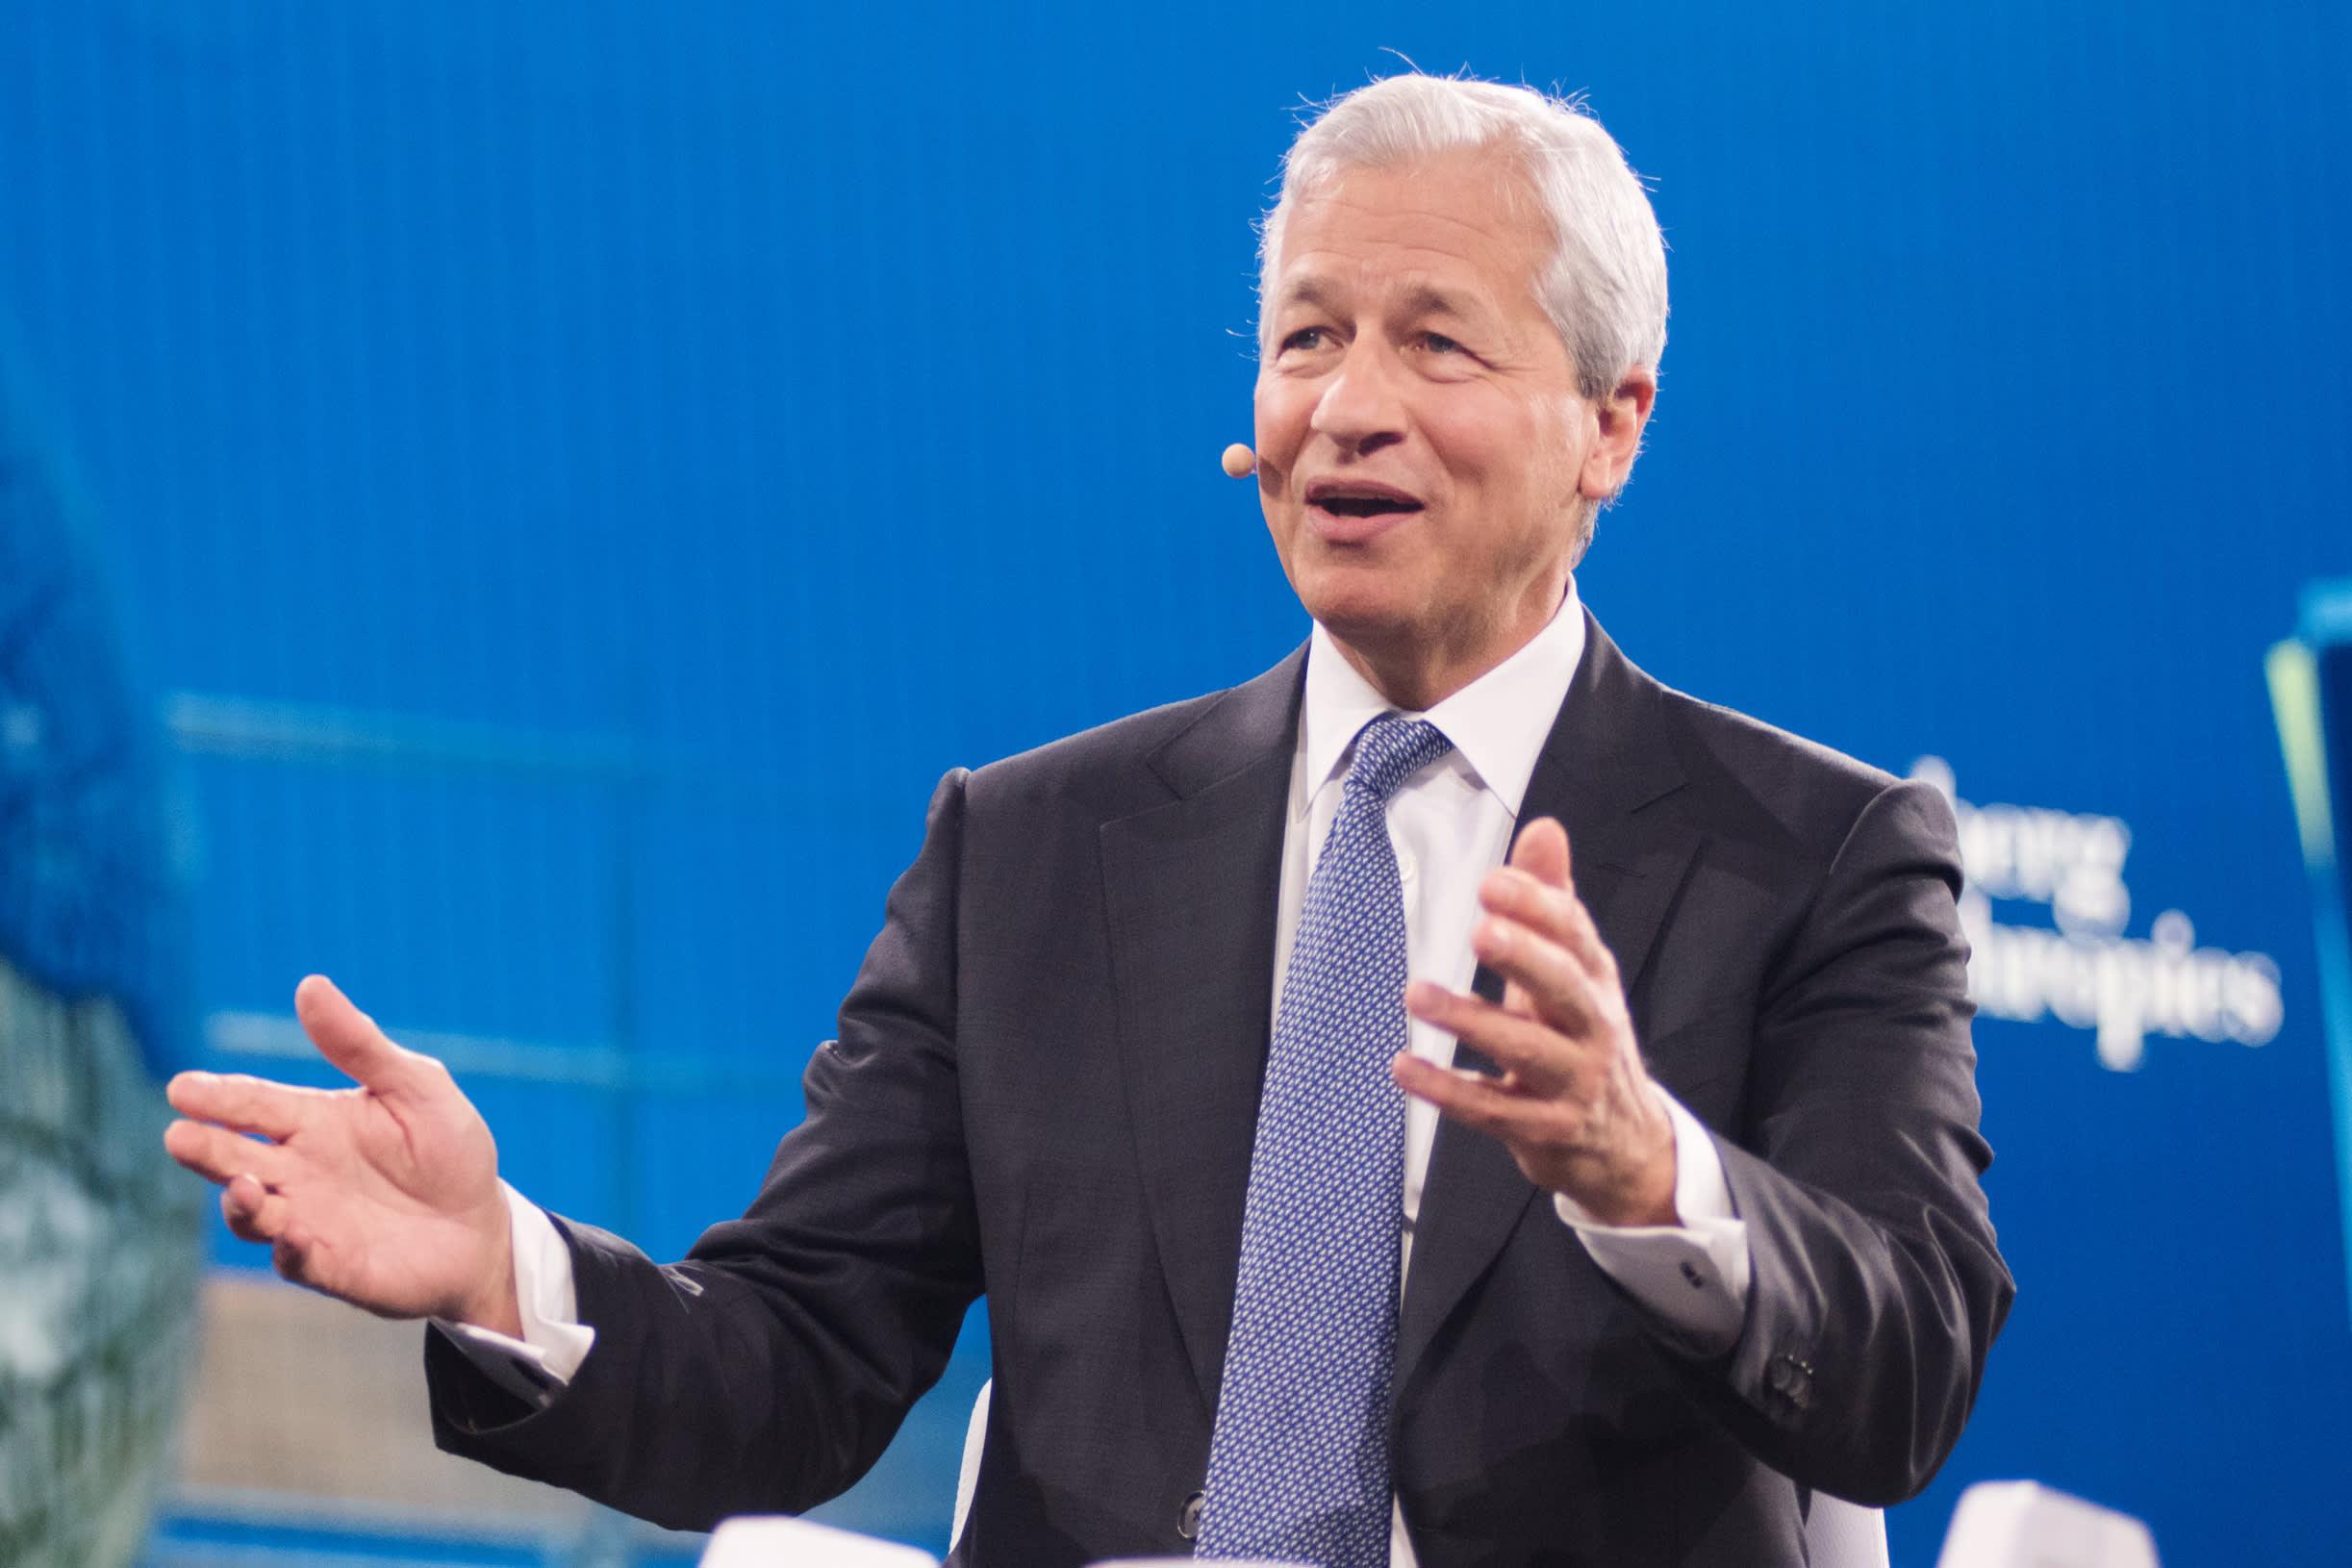 JPMorgan and Goldman kick off bank earnings Wednesday